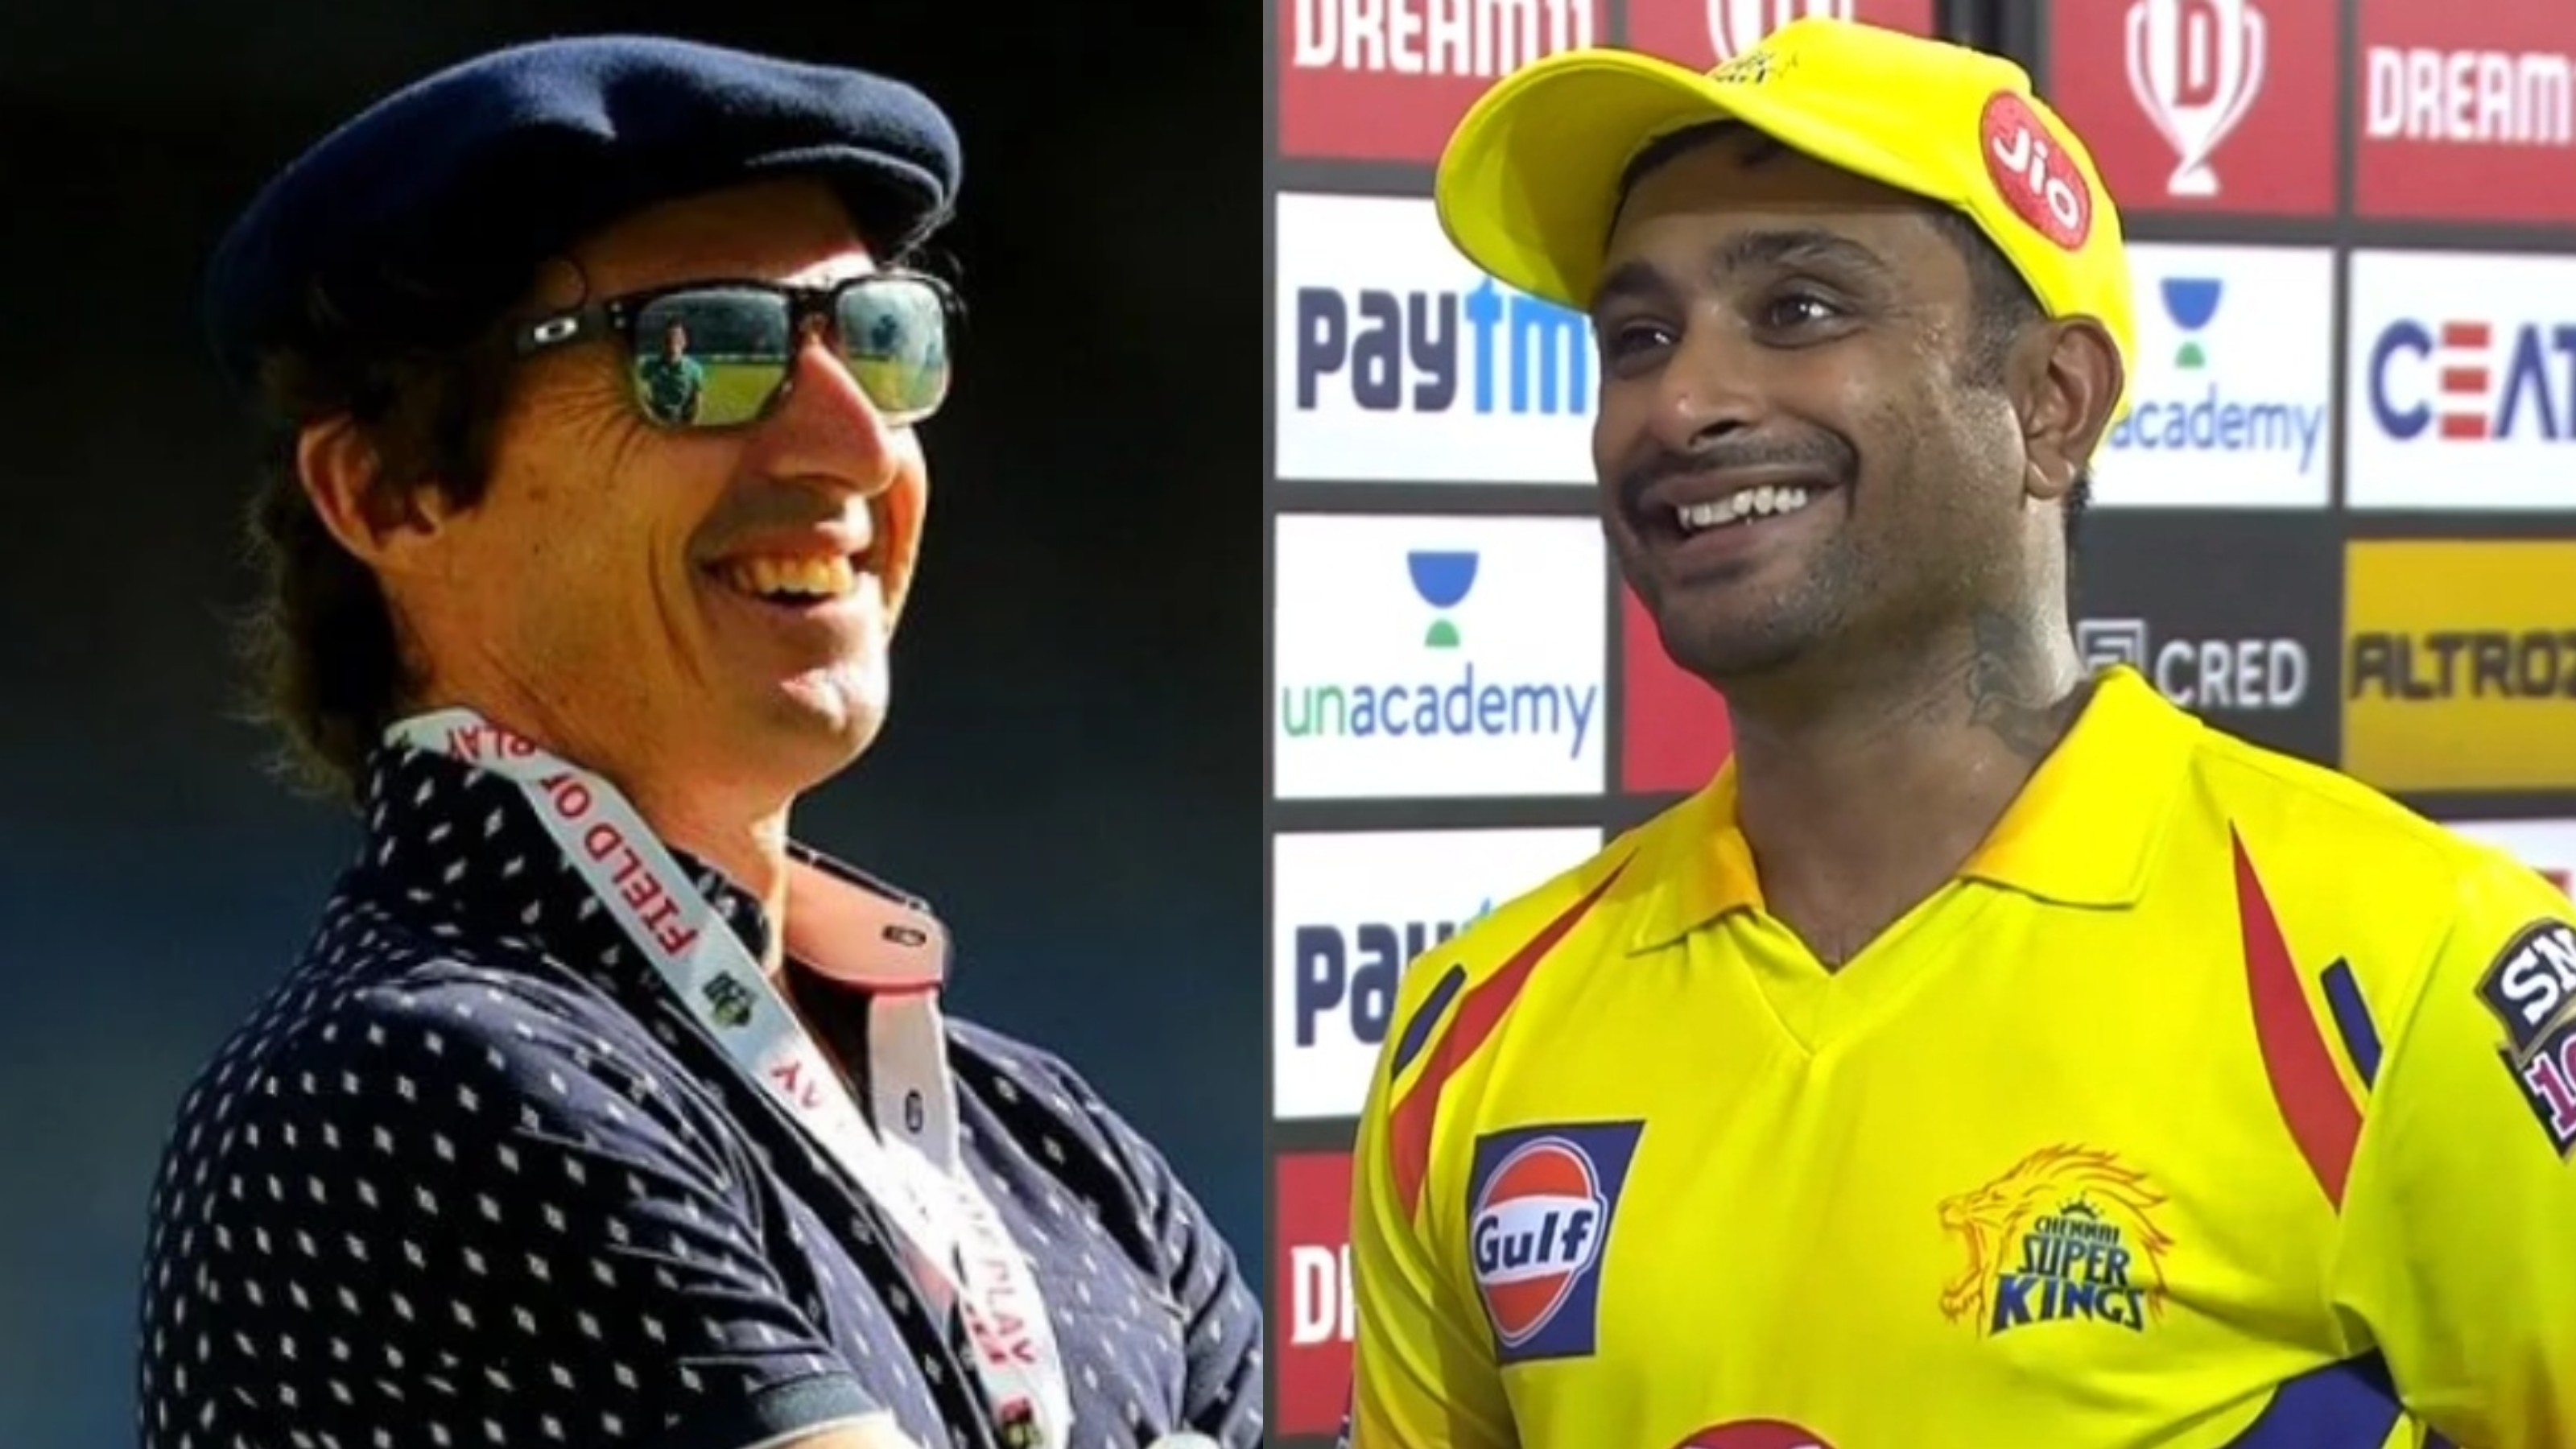 IPL 2020: Brad Hogg feels Ambati Rayudu will play for India sooner rather than later